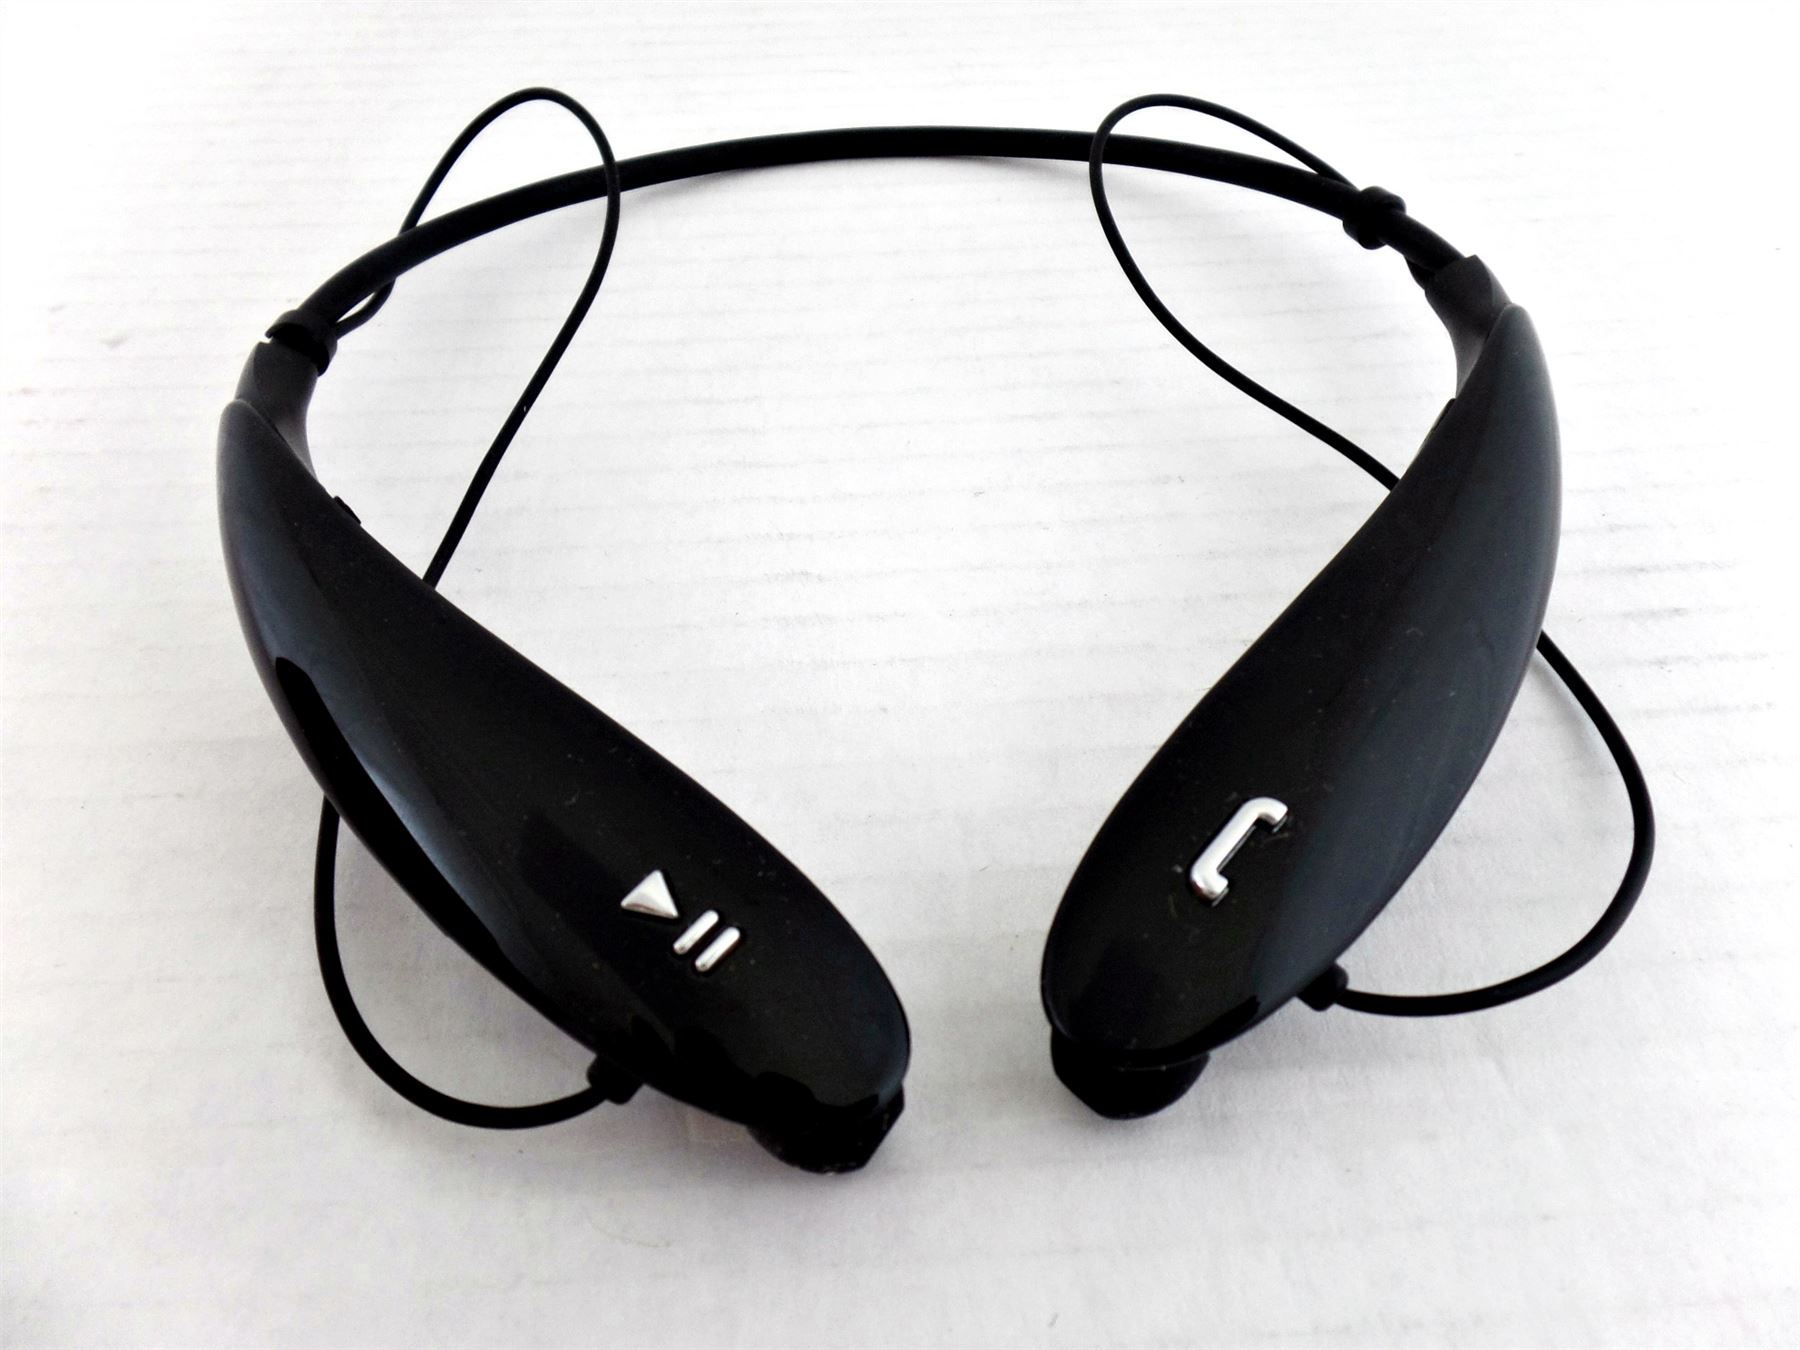 Earphone bluetooth lg - lg jbl bluetooth earbuds